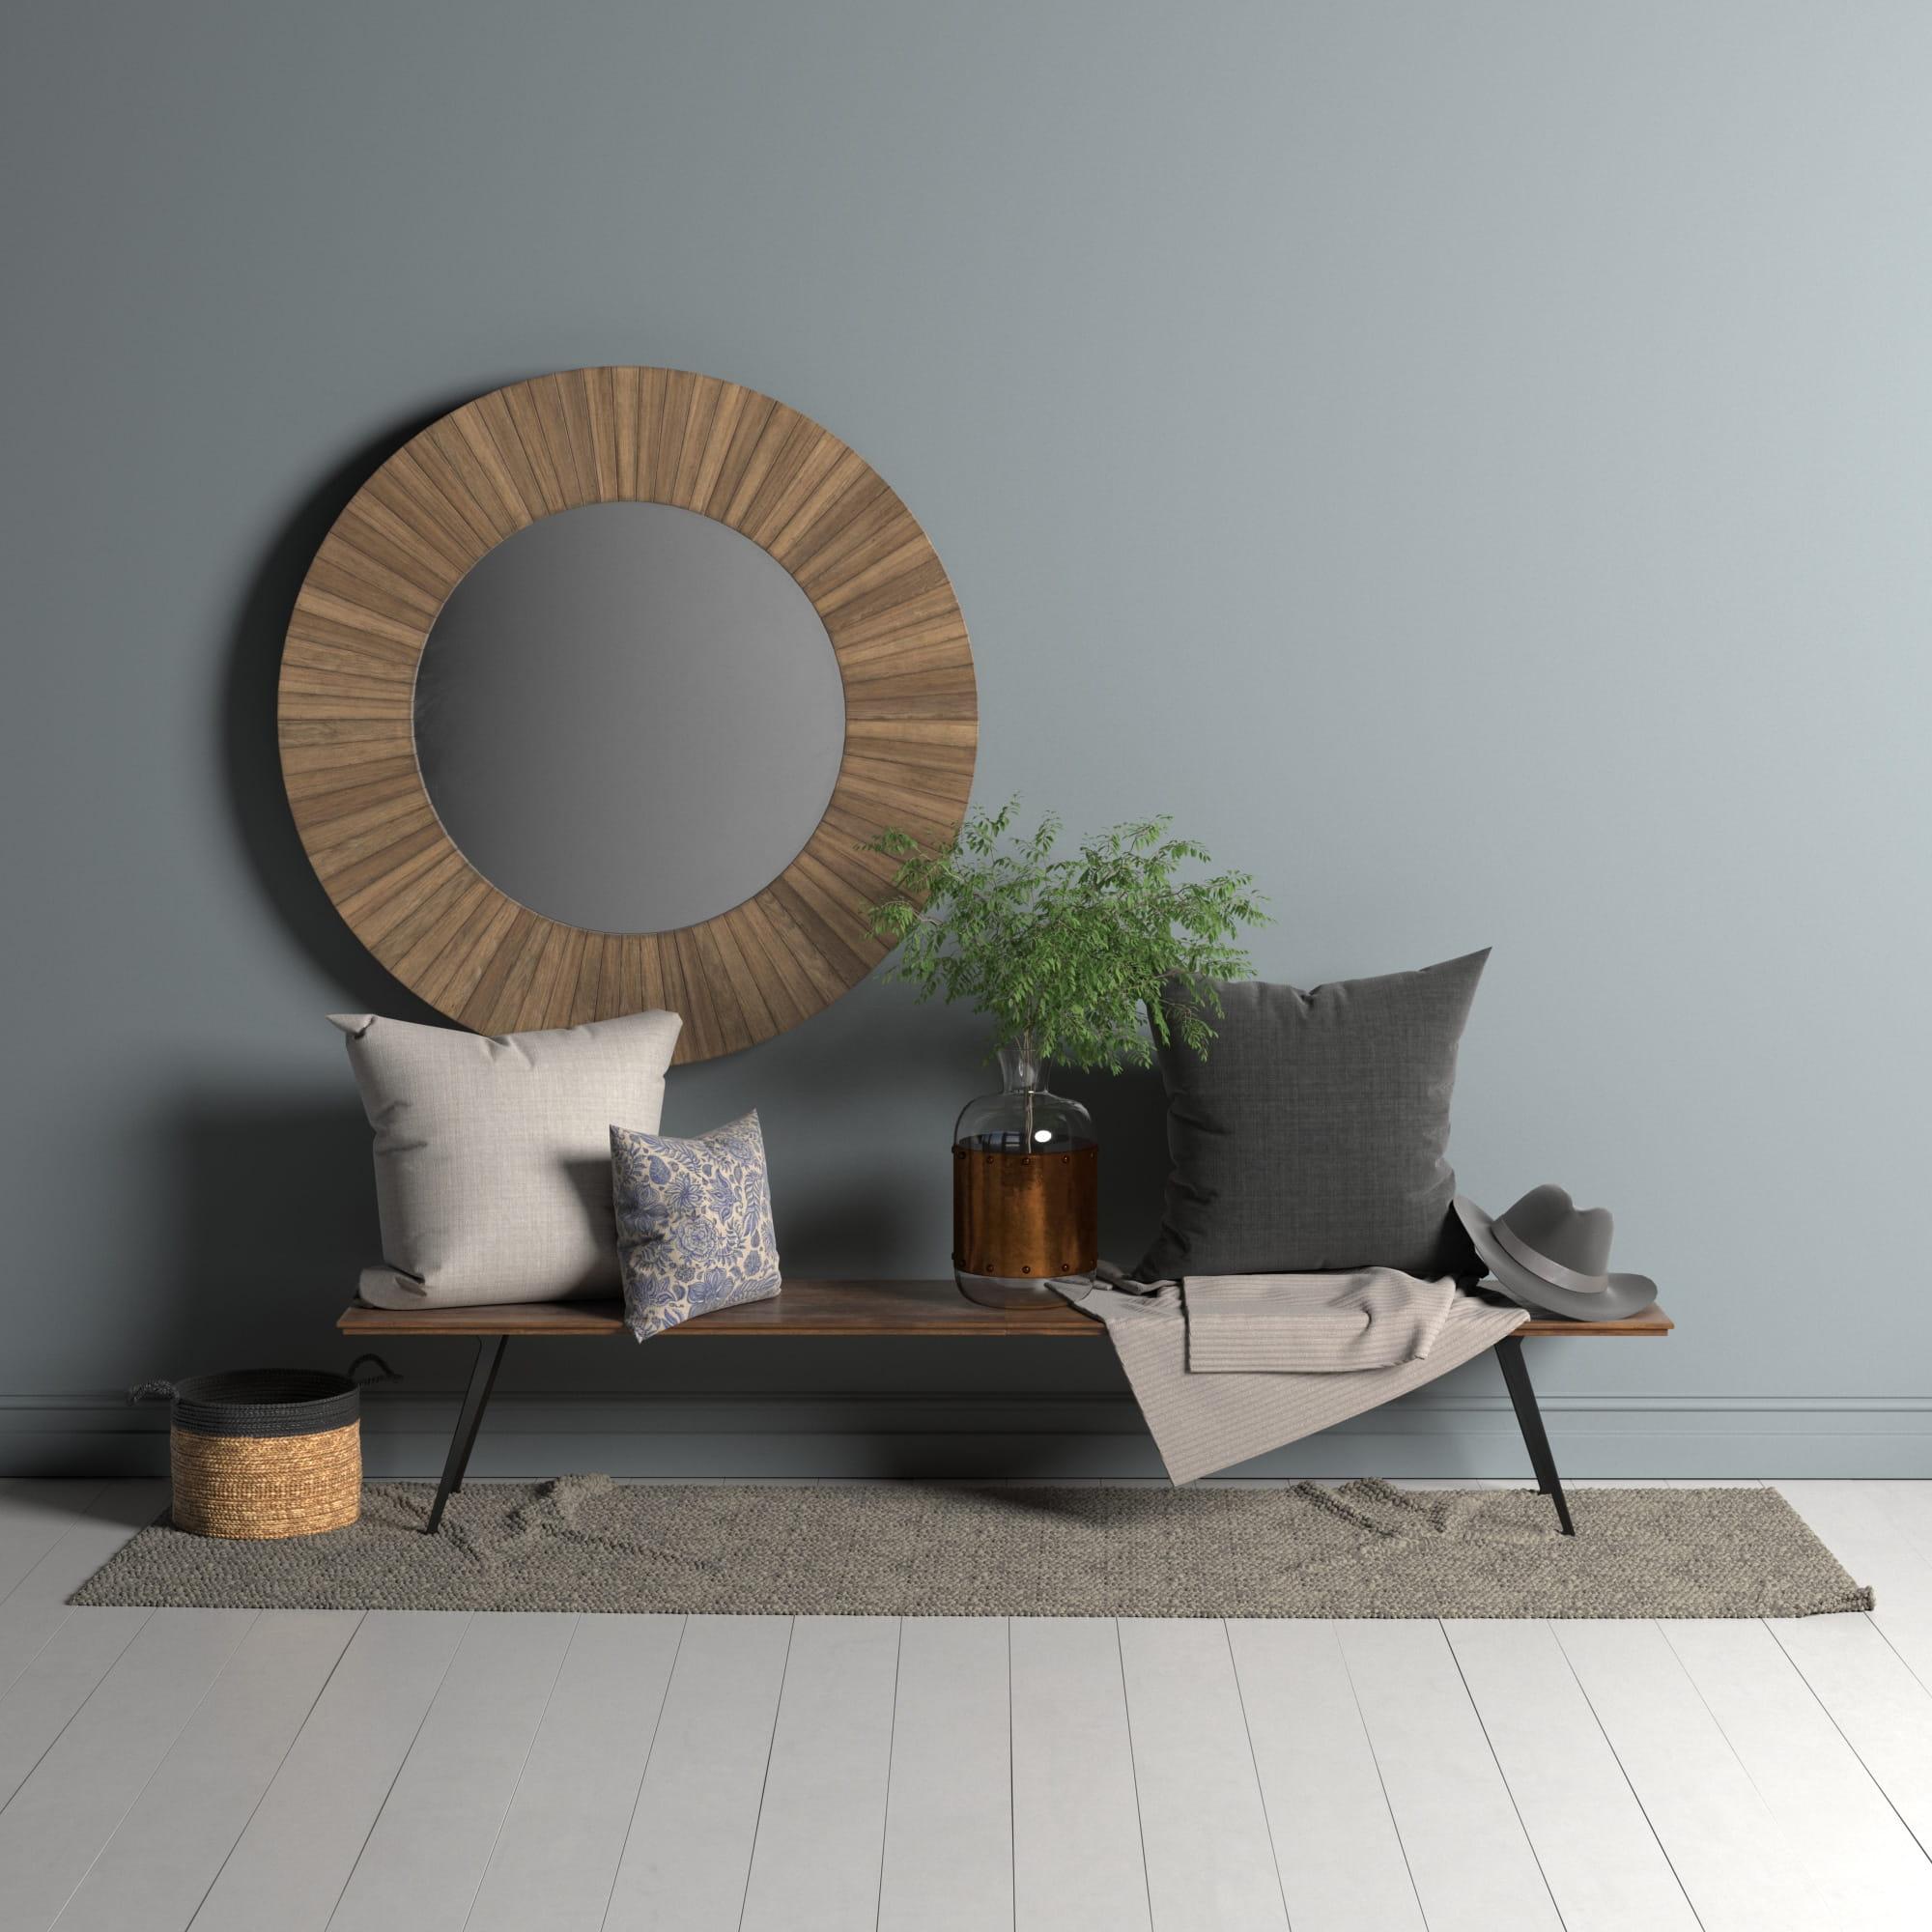 furniture set 23 AM225